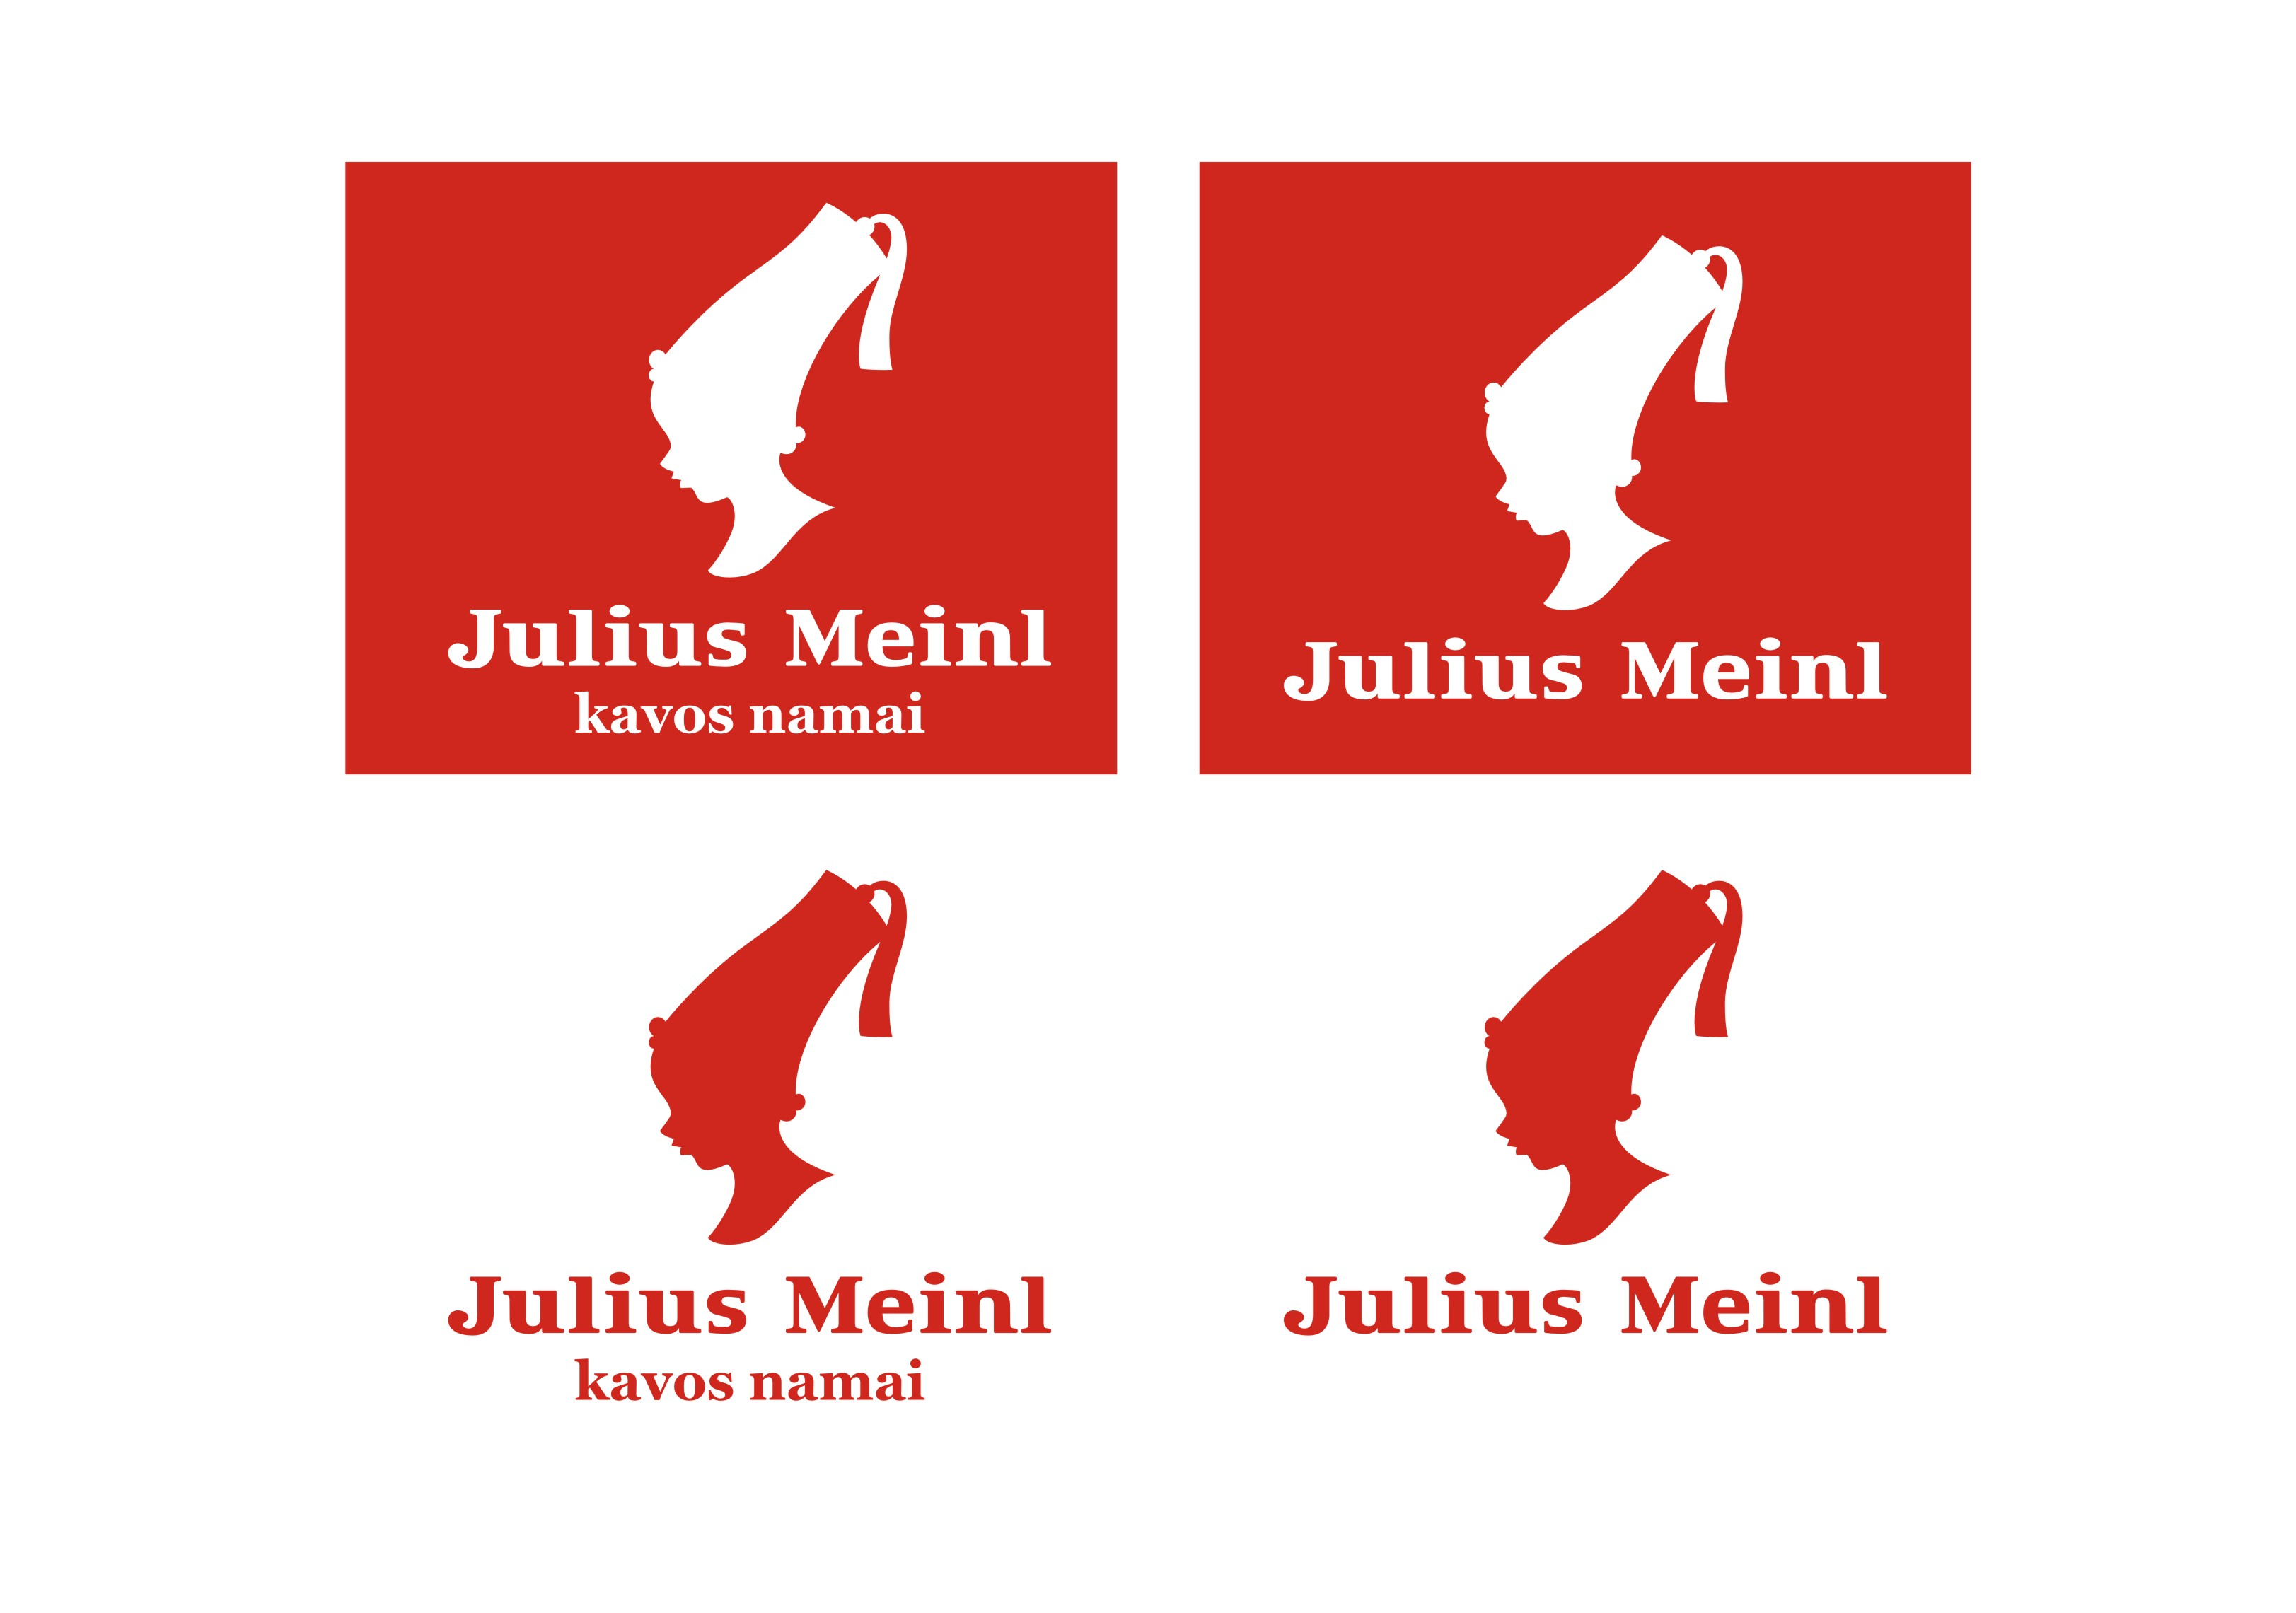 julius_meinl_logo